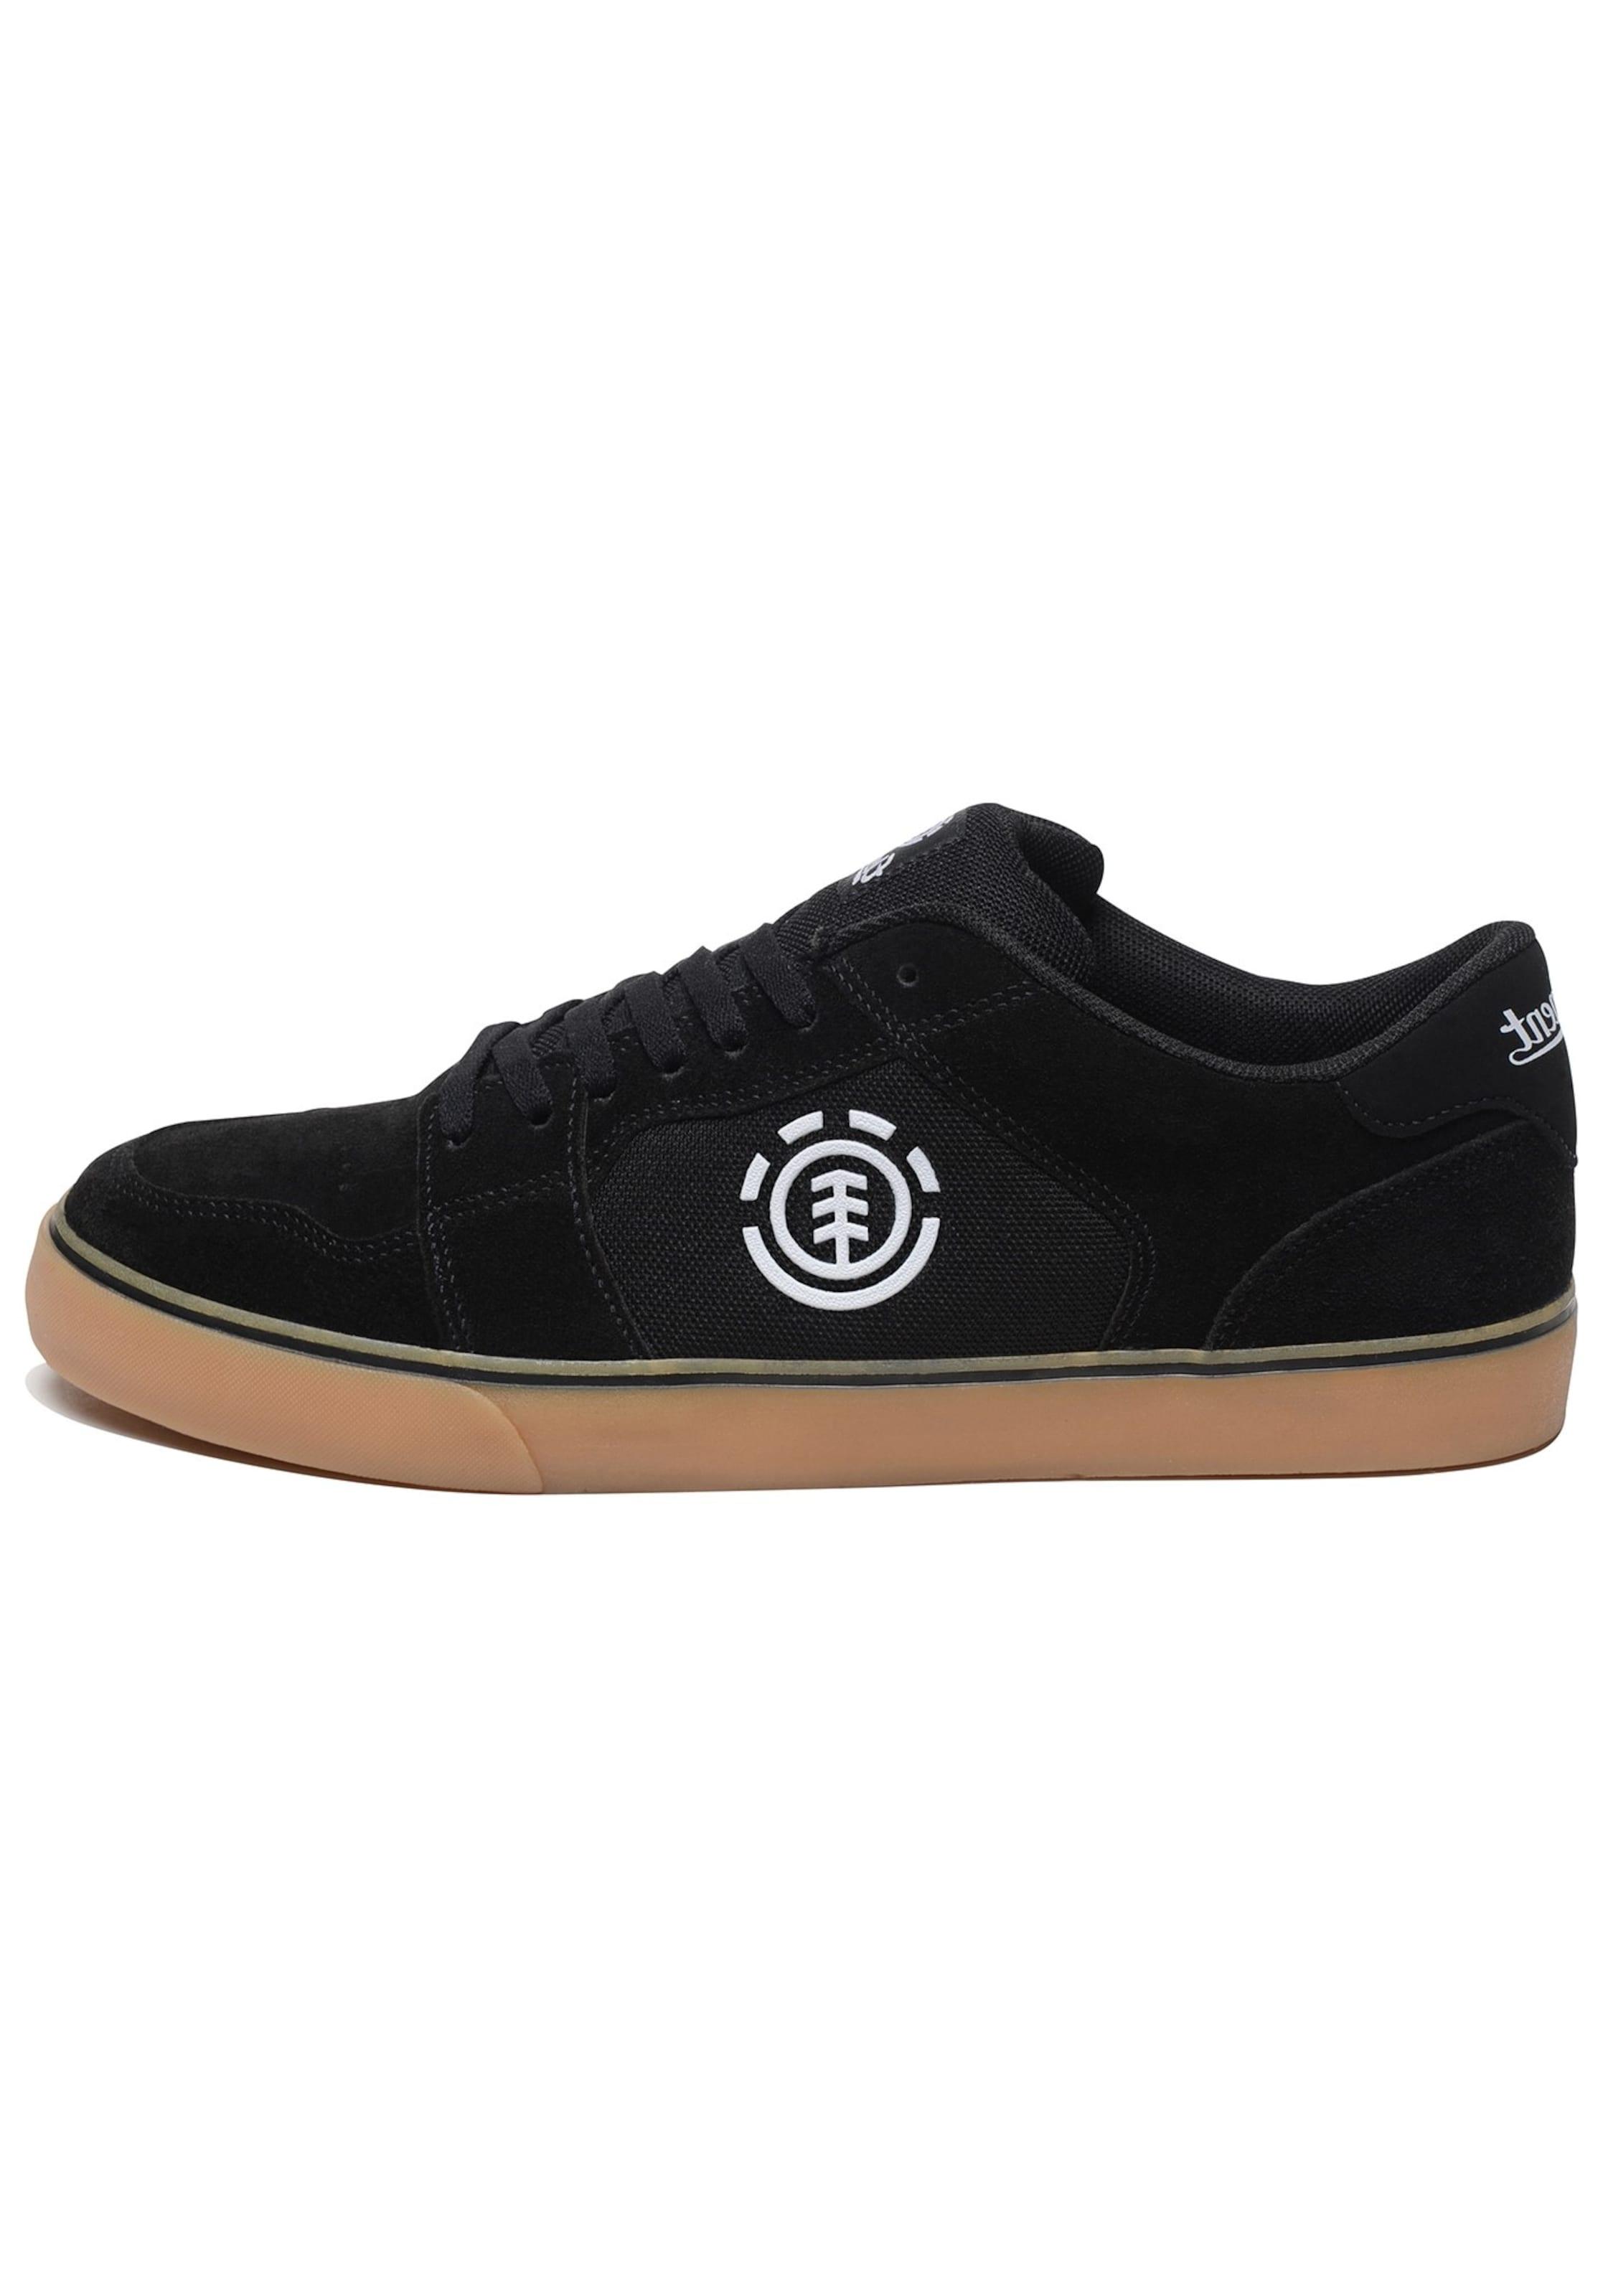 ELEMENT  Heatley  Sneaker